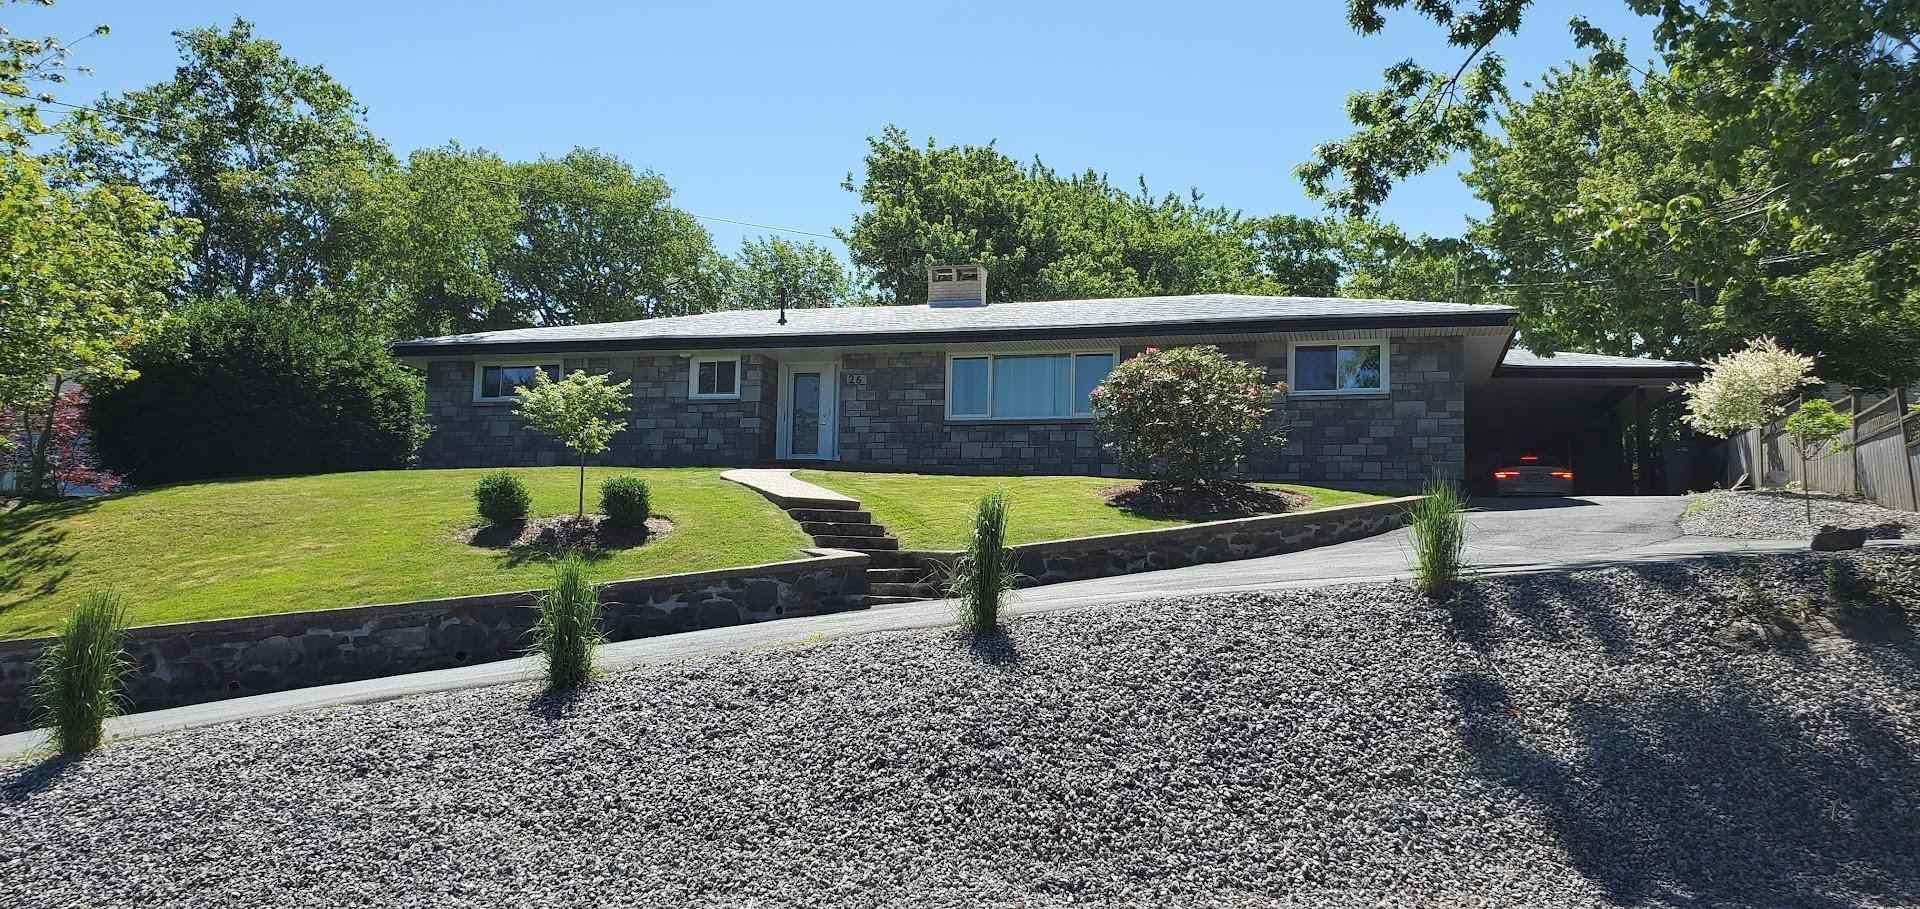 Main Photo: 26 Edward Laurie Drive in Halifax: 5-Fairmount, Clayton Park, Rockingham Residential for sale (Halifax-Dartmouth)  : MLS®# 202123561